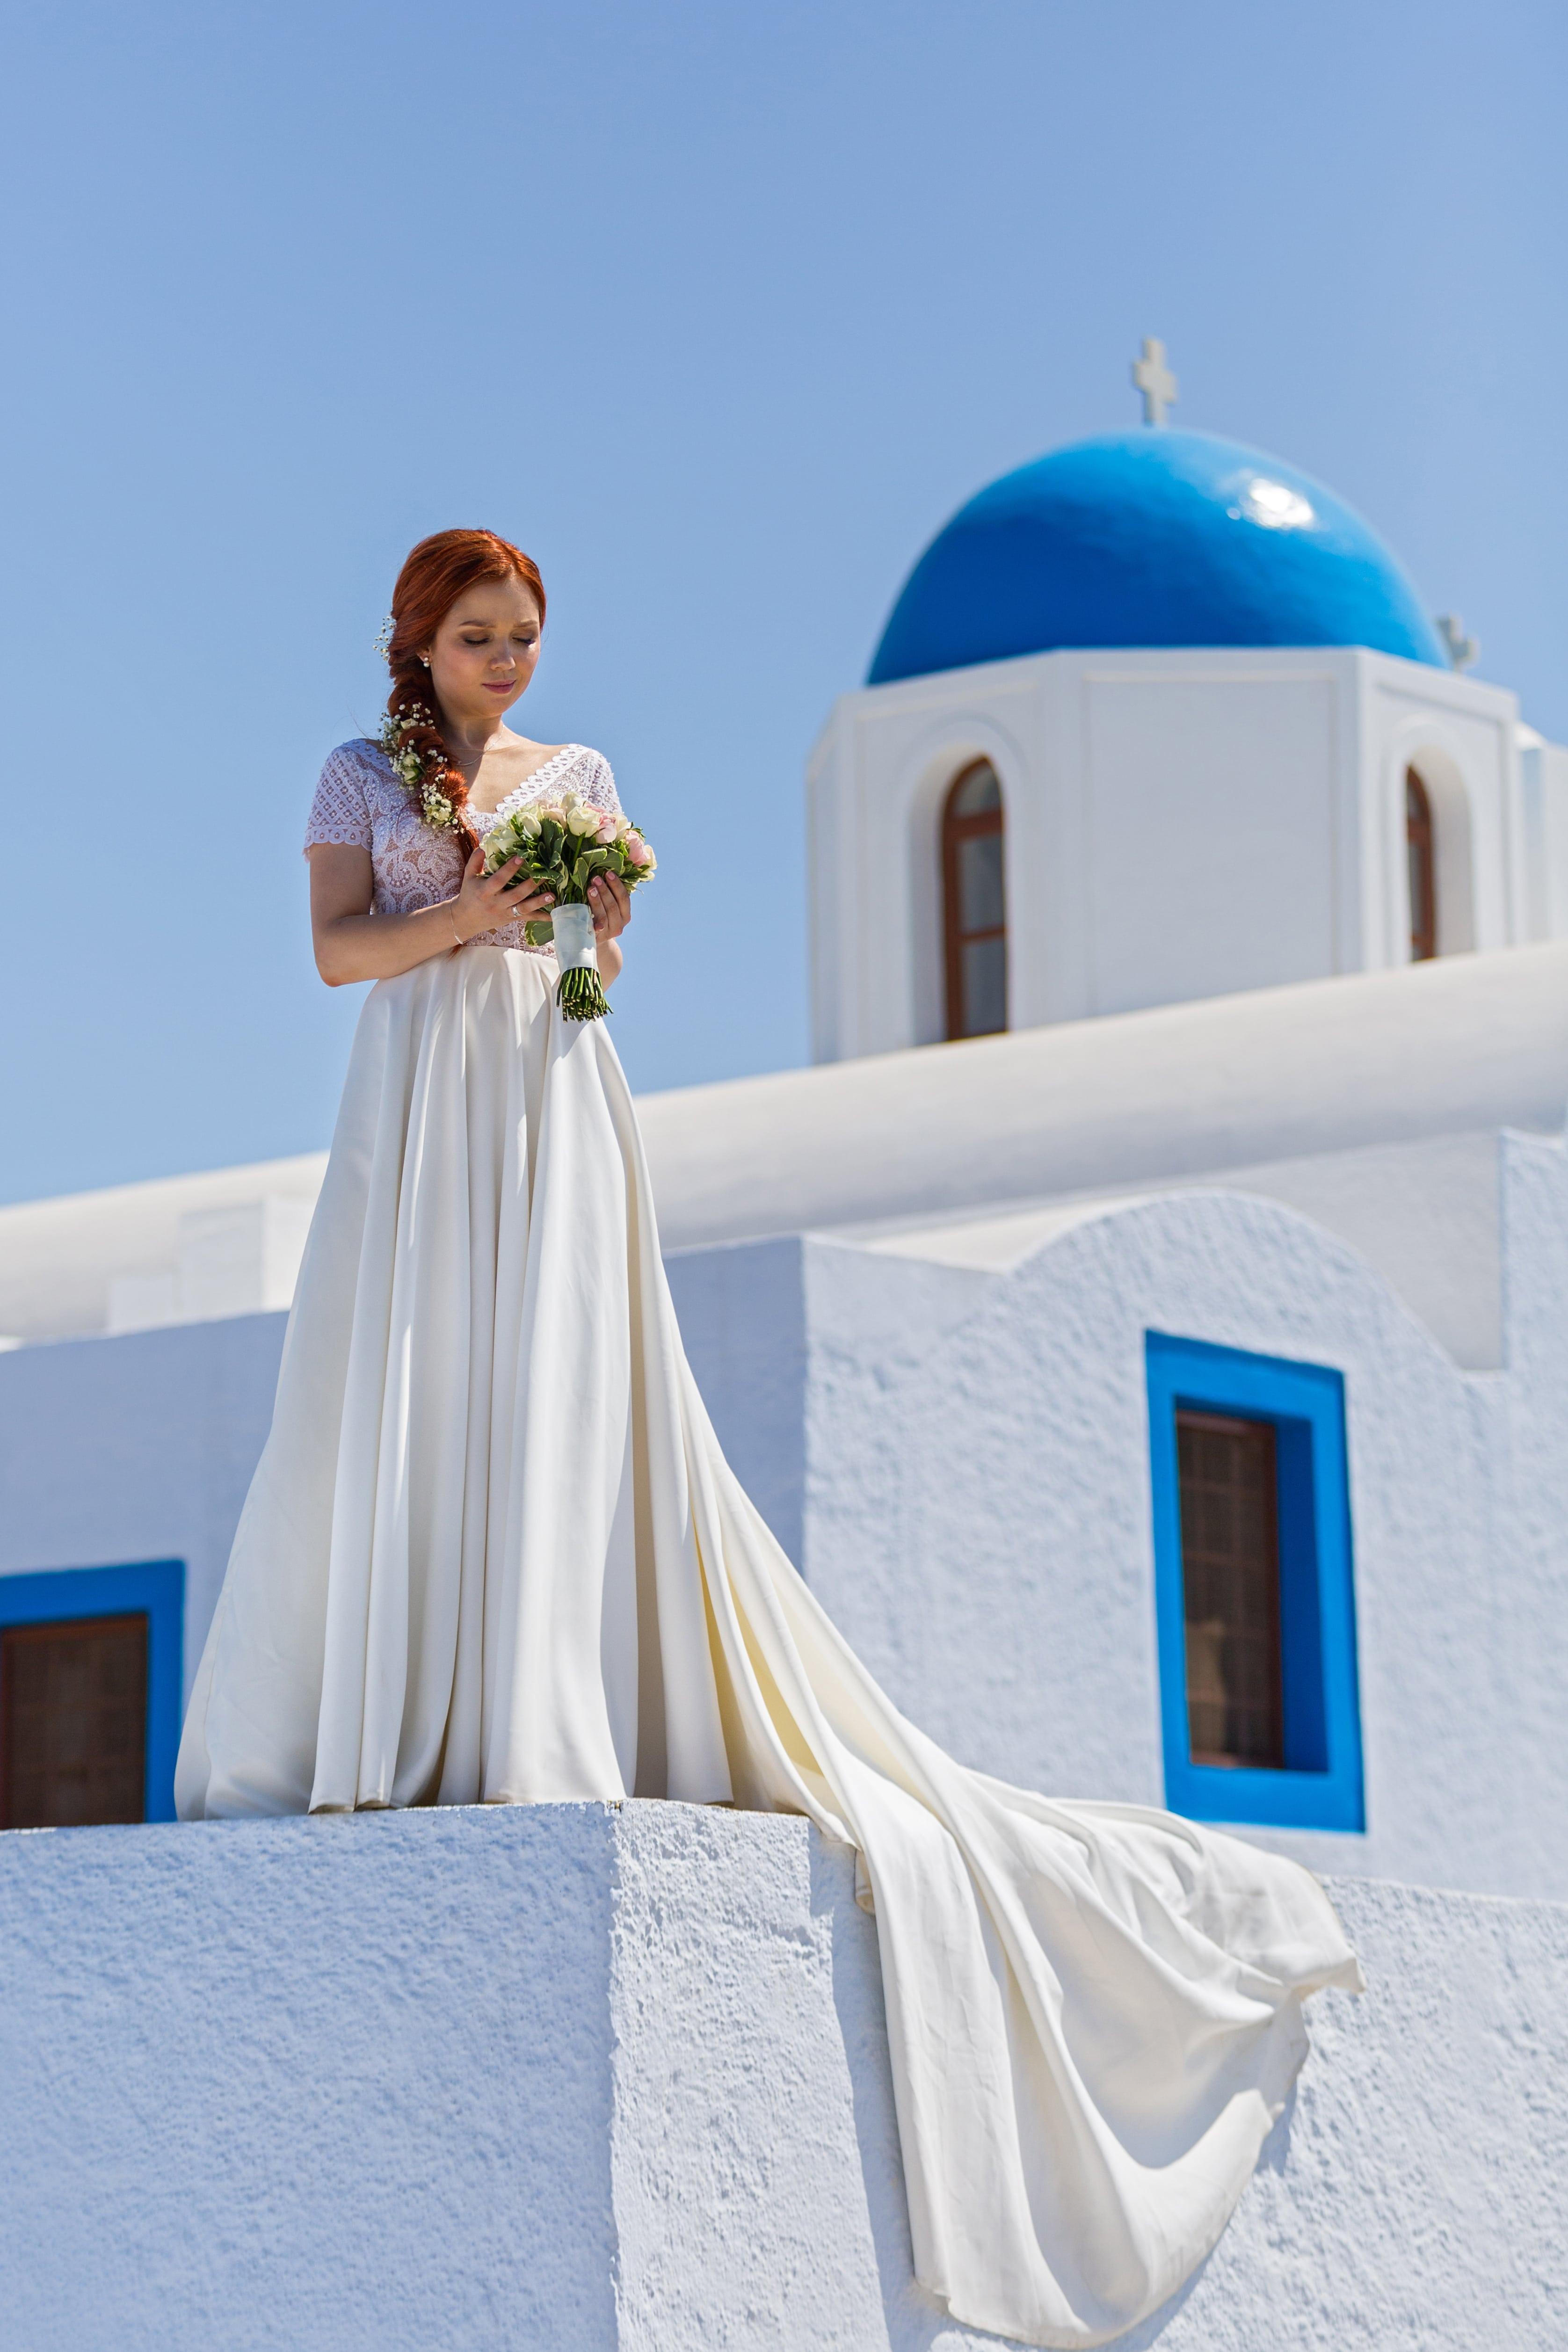 Next day Γάμου - Όμορφη next day φωτογράφιση στην Πάρο